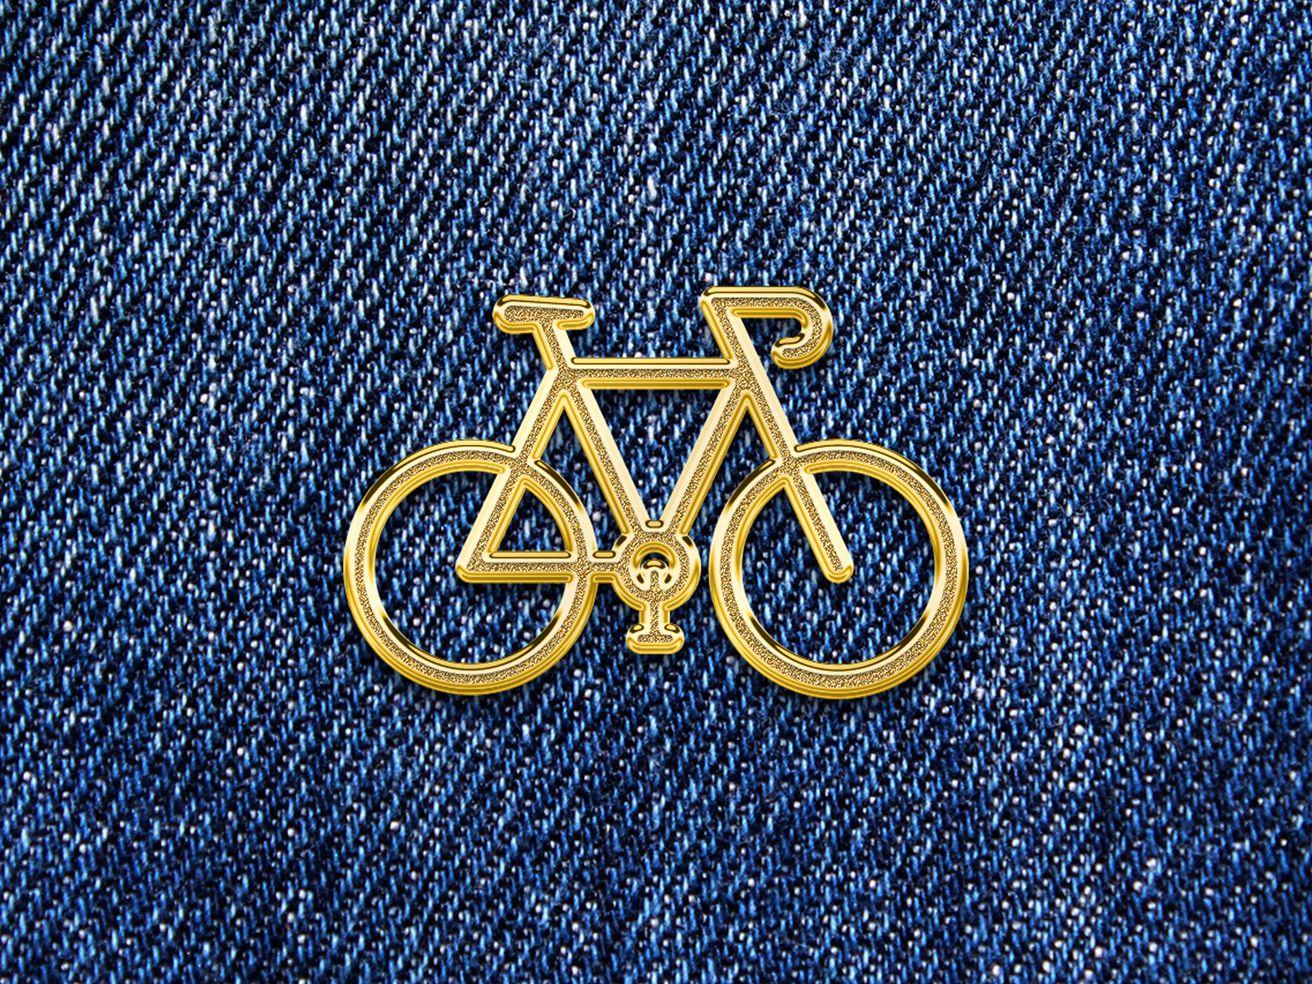 Gold Emblem Pin Mockup Emblems Enamel Pins Photoshop Mockup